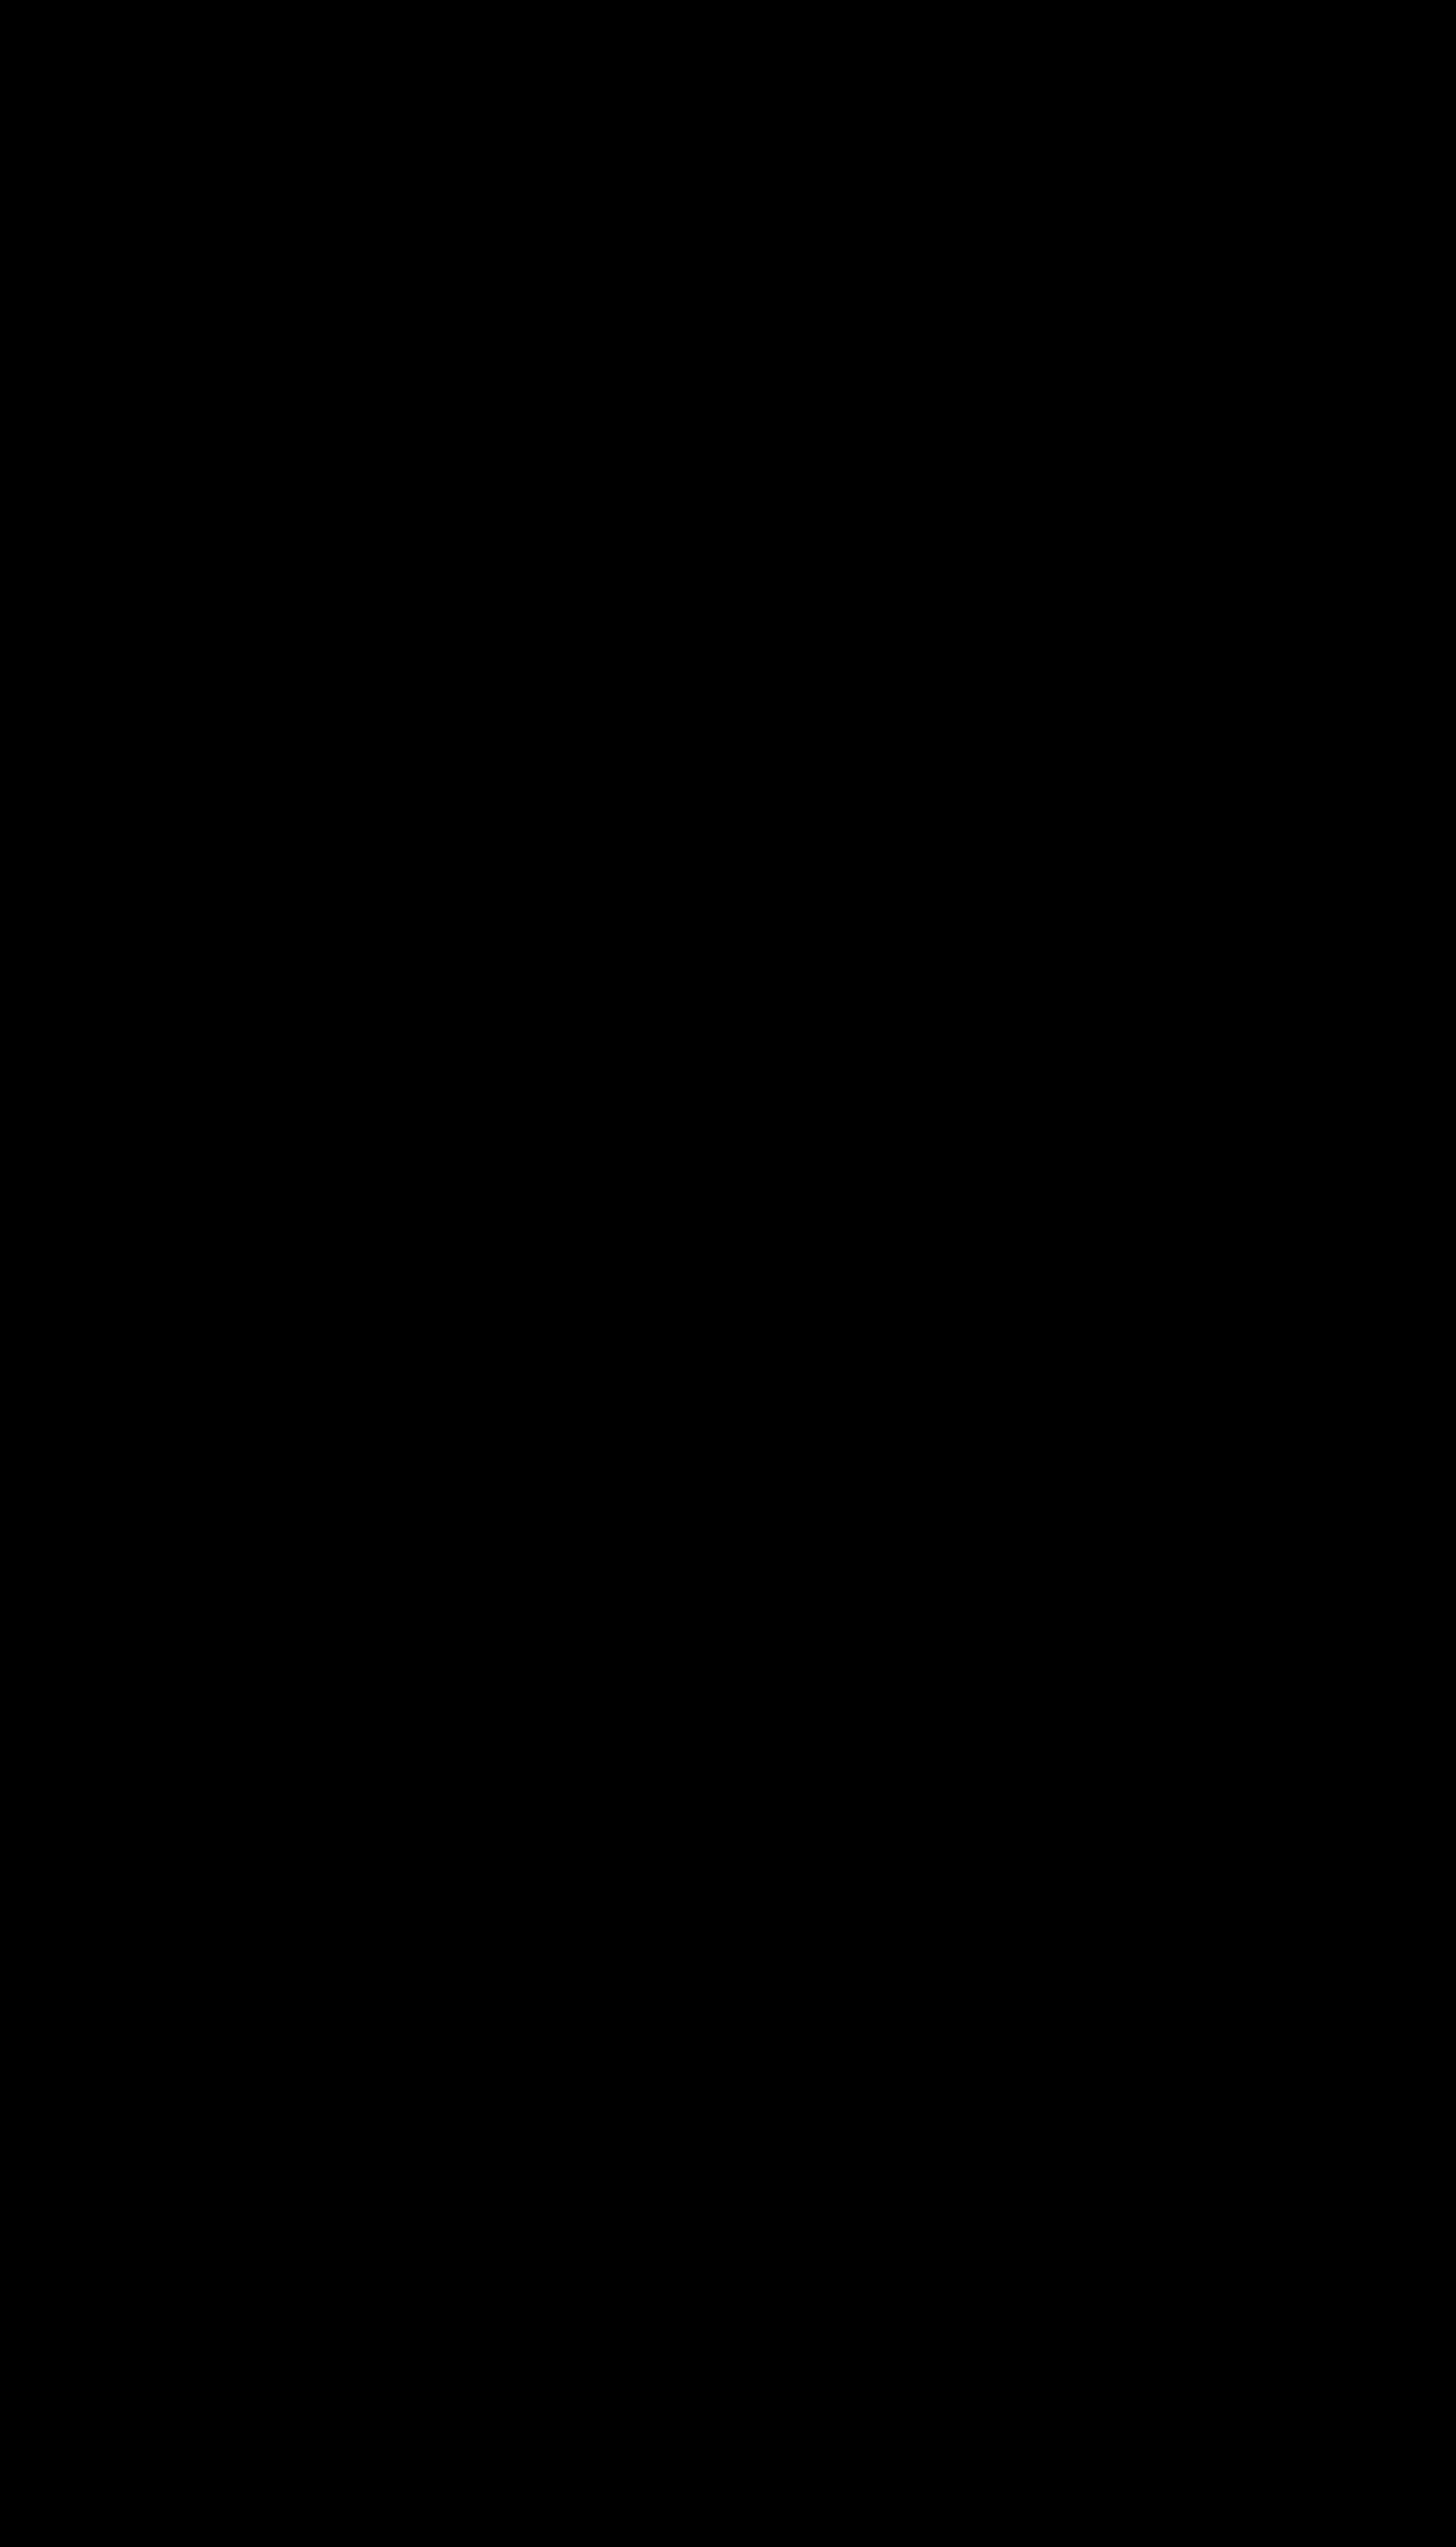 Lineart 028 - Vegeta 009 by VICDBZ